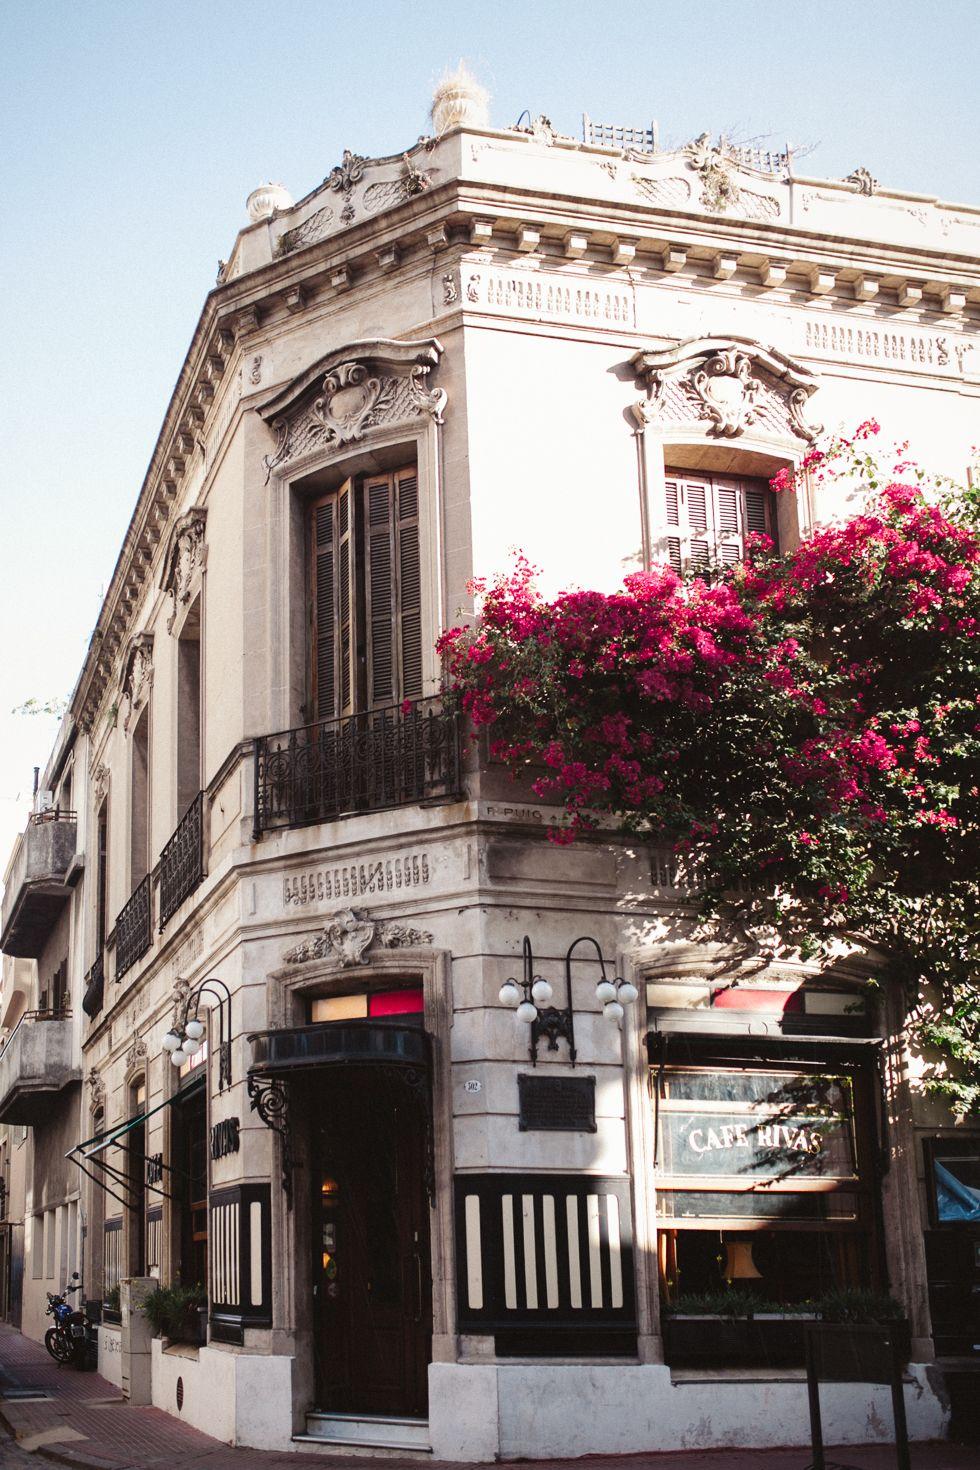 *Cafe Rivas Photo Courtesy of Pinterest.jpg